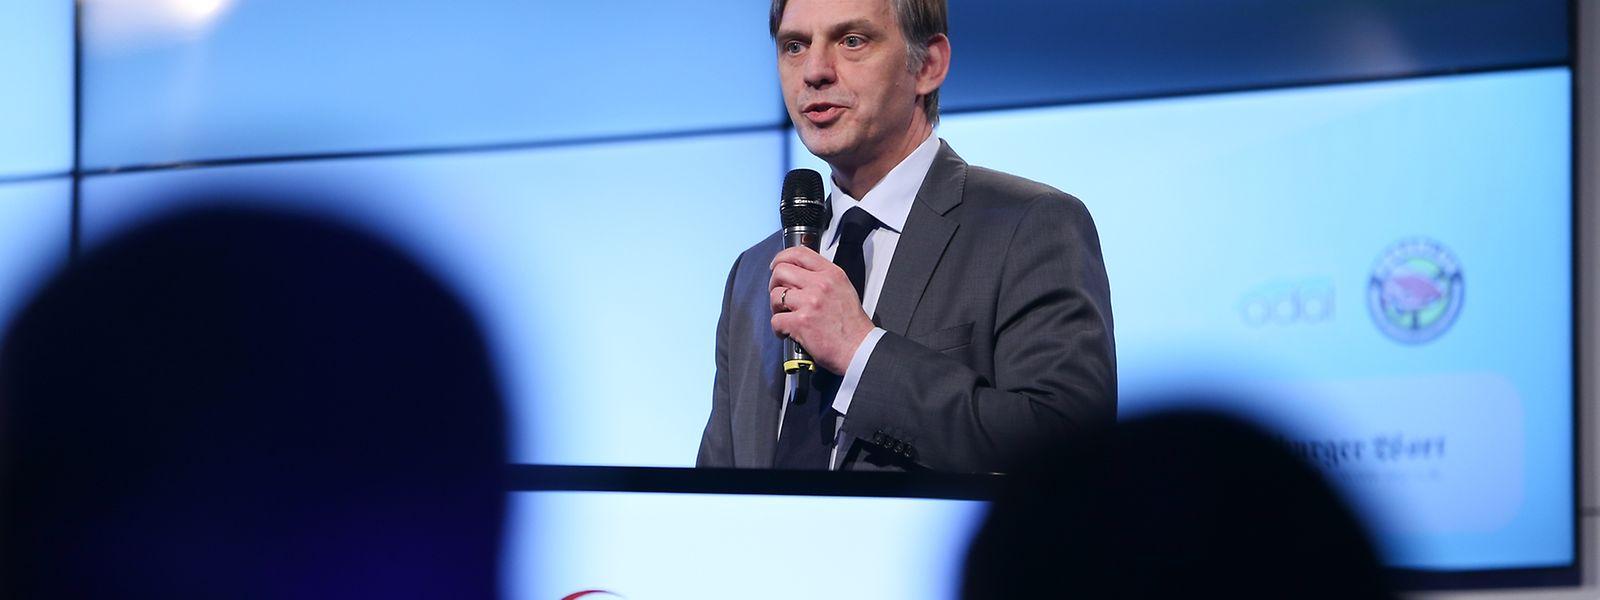 O diretor-geral do grupo Saint-Paul Luxembourg, Paul Peckels